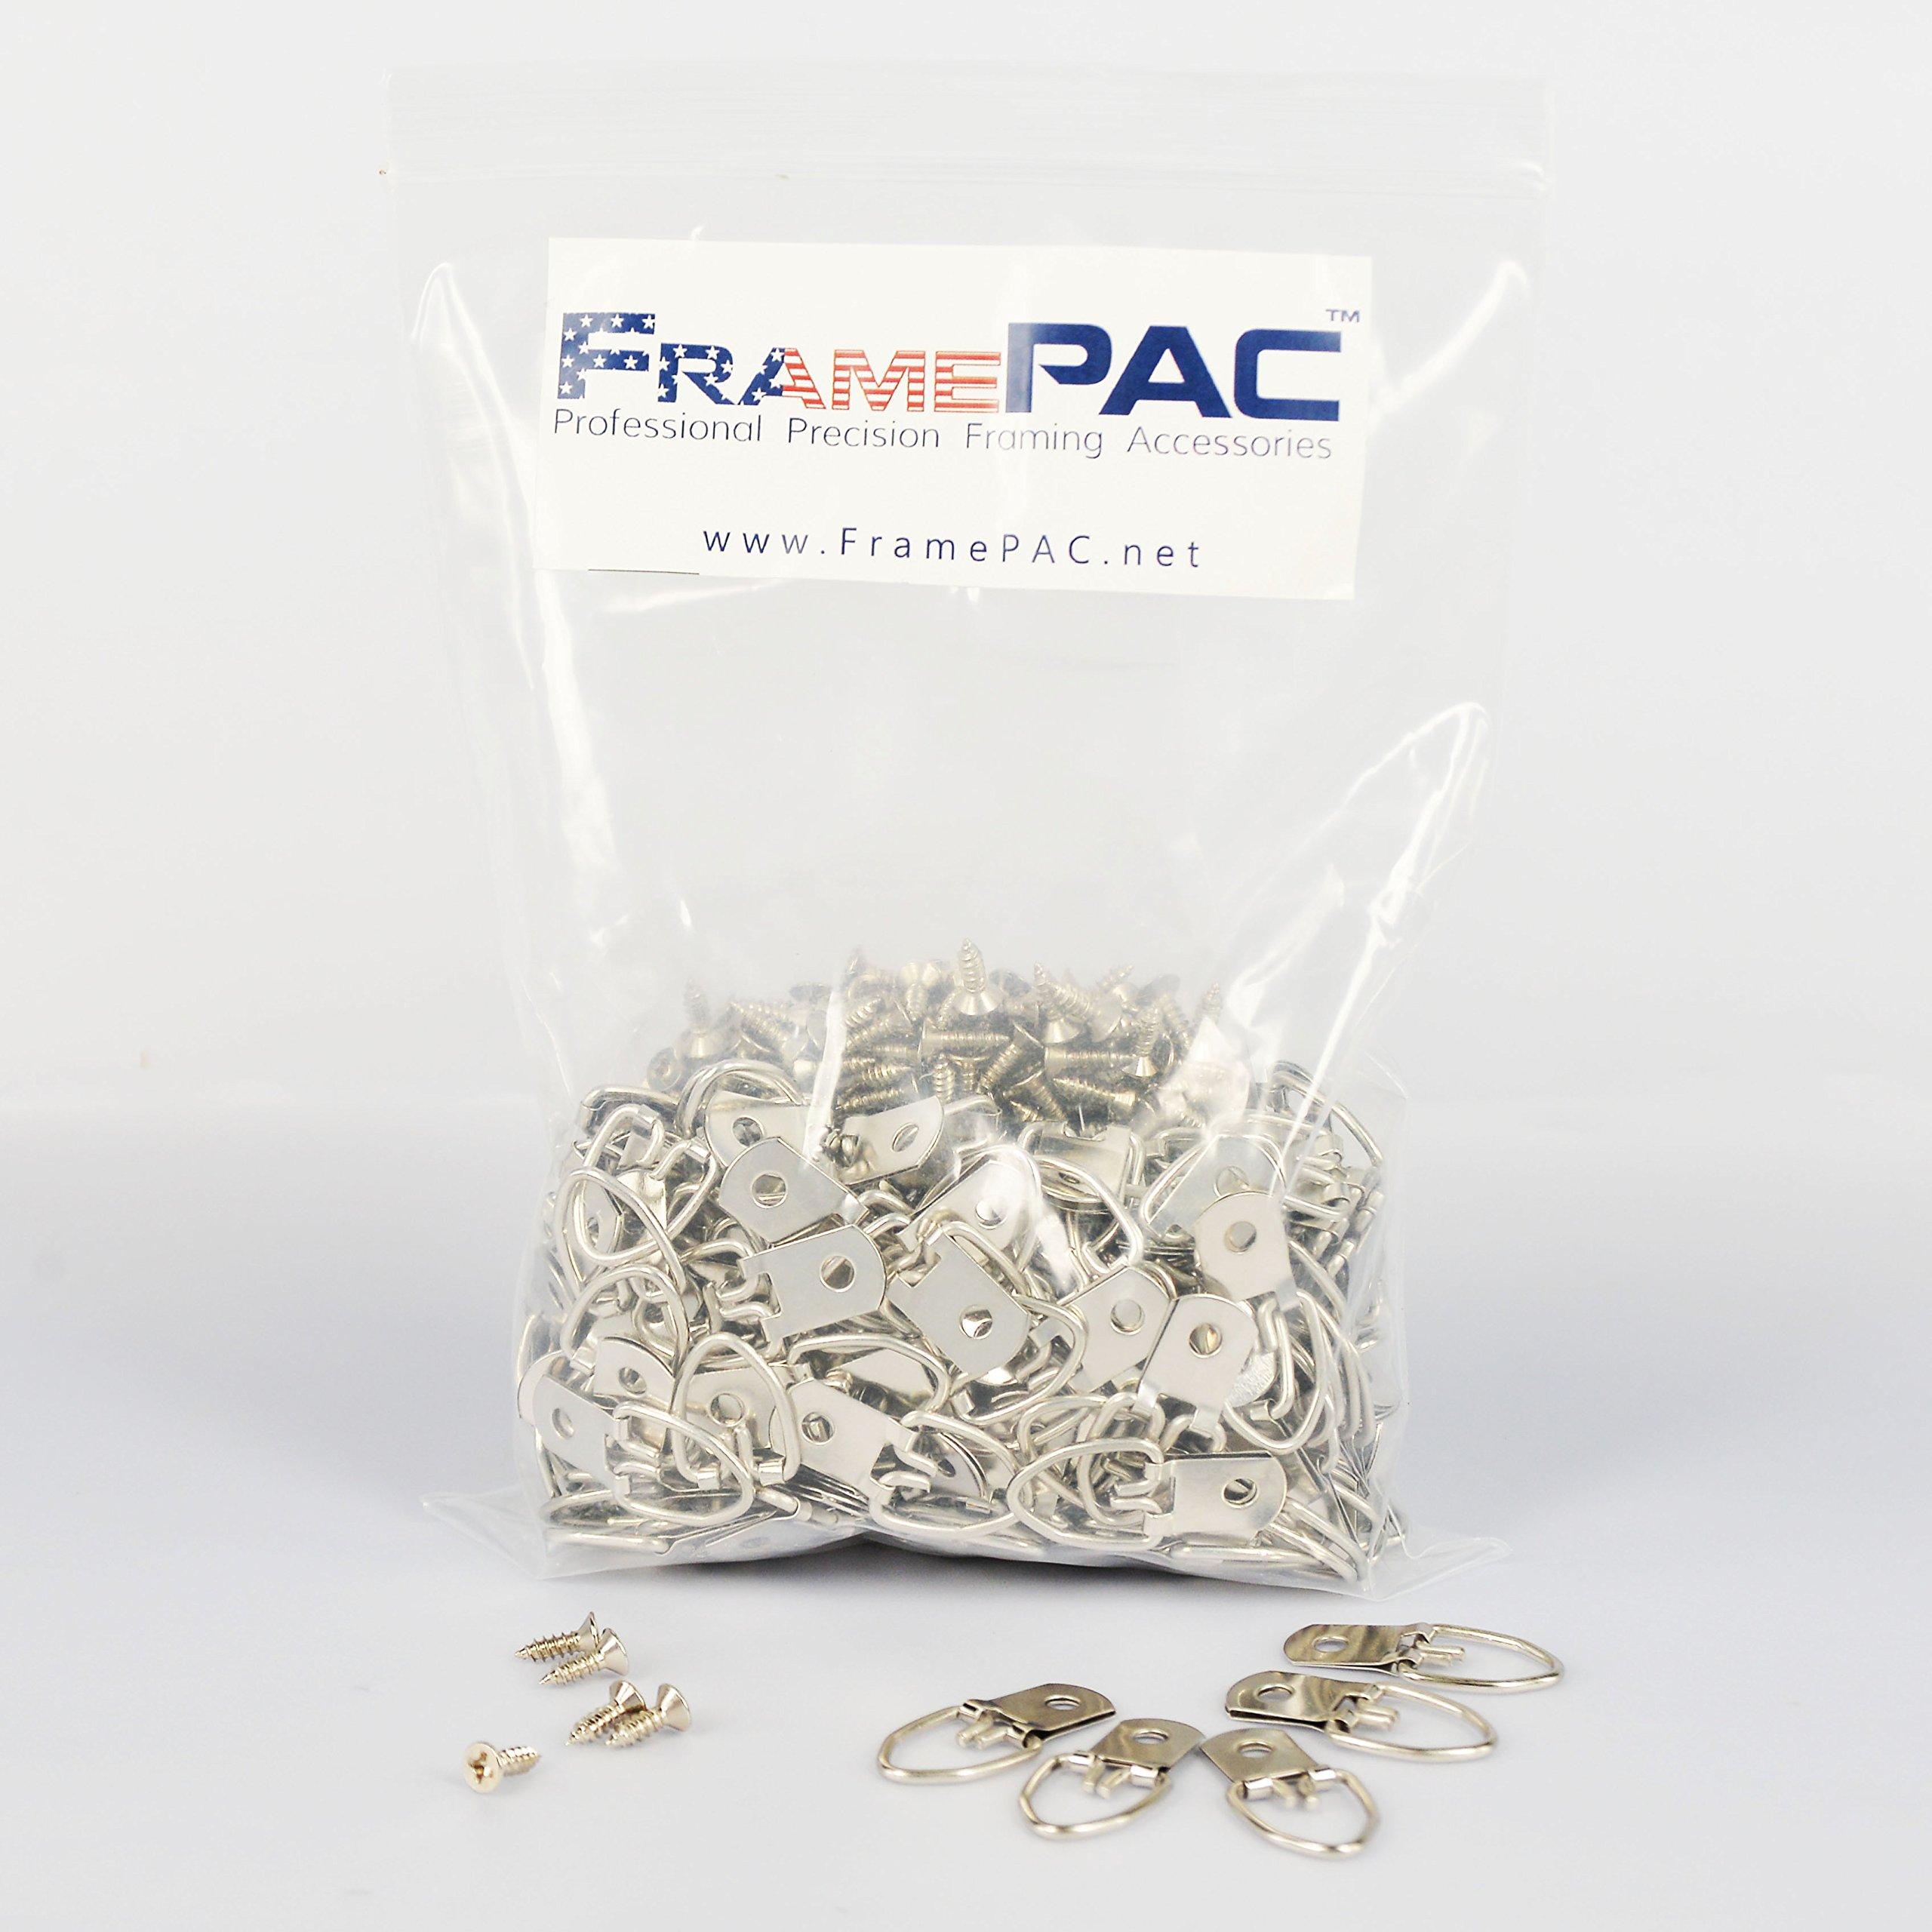 Picture Frames Single Hole Clasp D Ring Hangers W/Screws (300 Pcs)